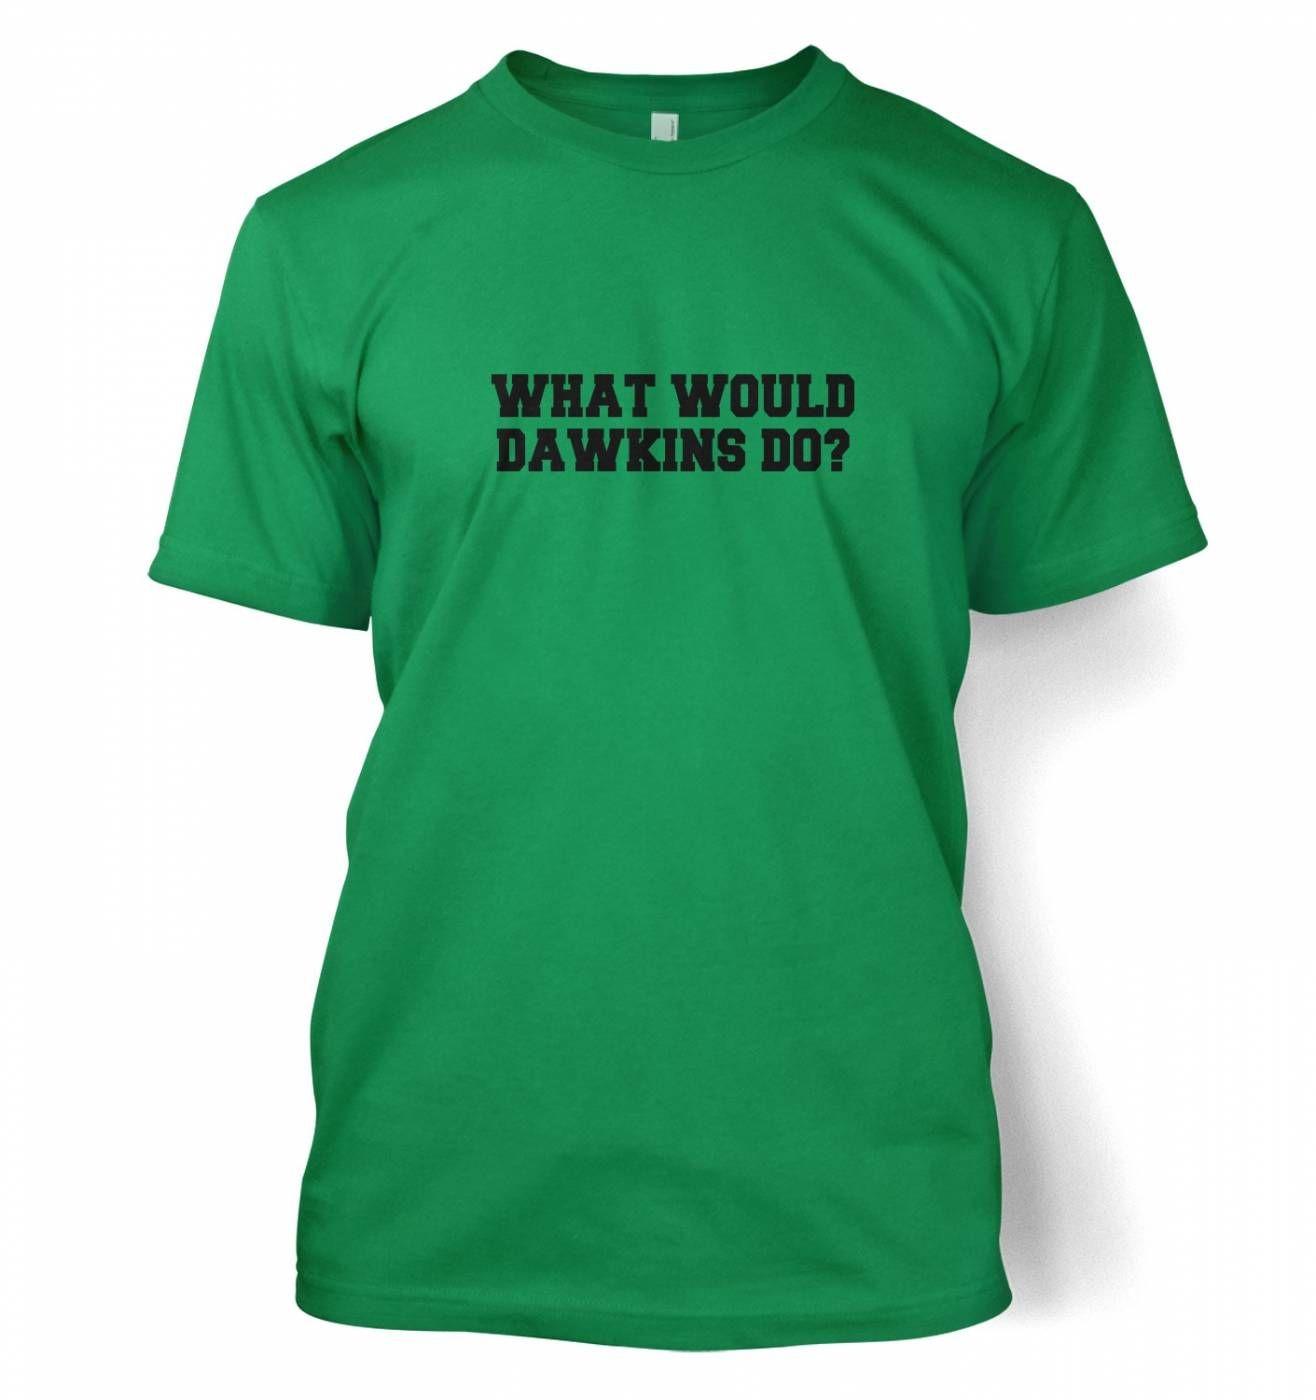 What Would Dawkins Do t-shirt